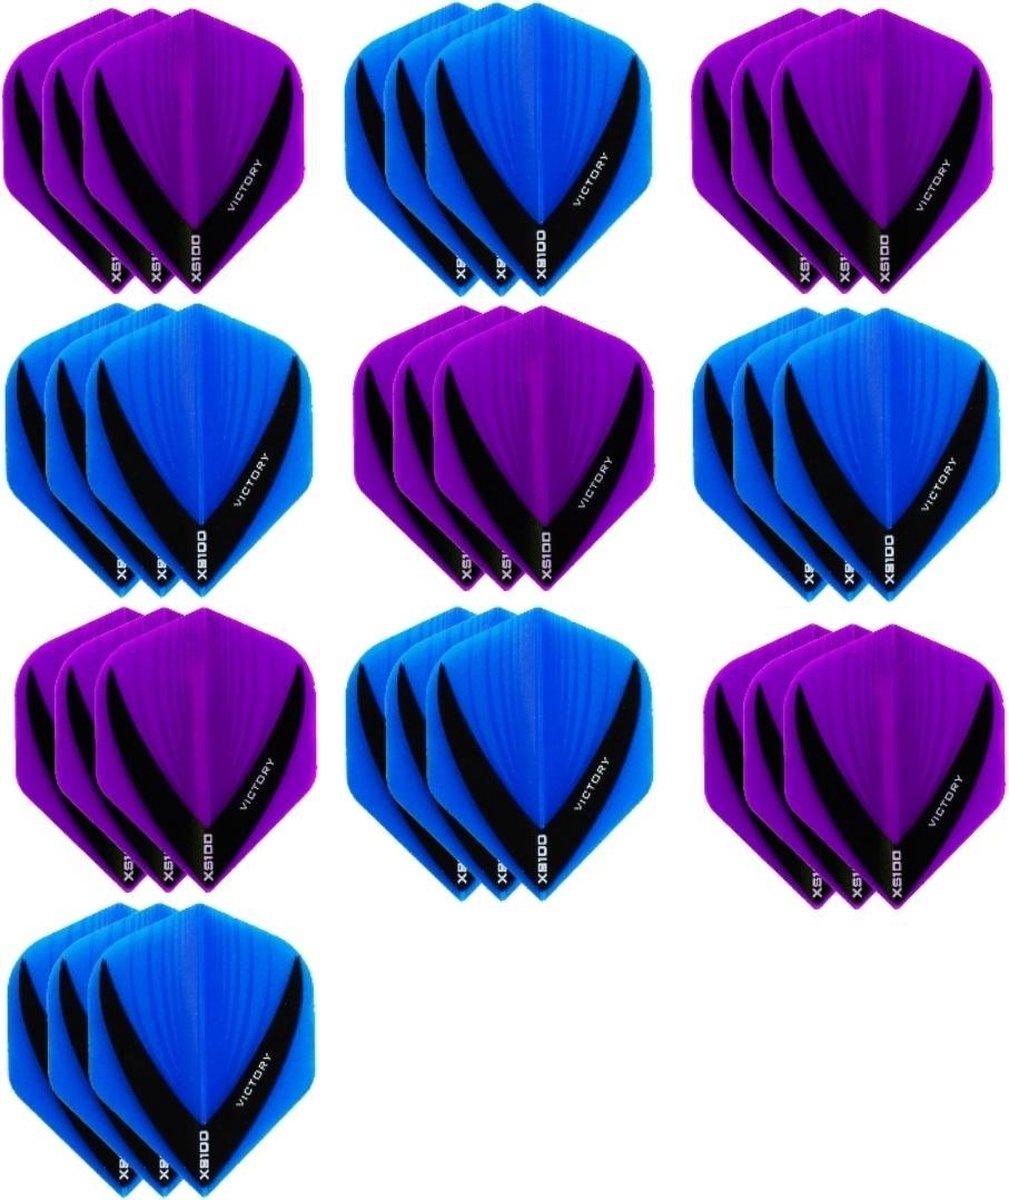 10 sets (30 stuks) - XS100 Vista flights - duo kleur pakket - Paars en Aqua/Blauw - flights - dartflights